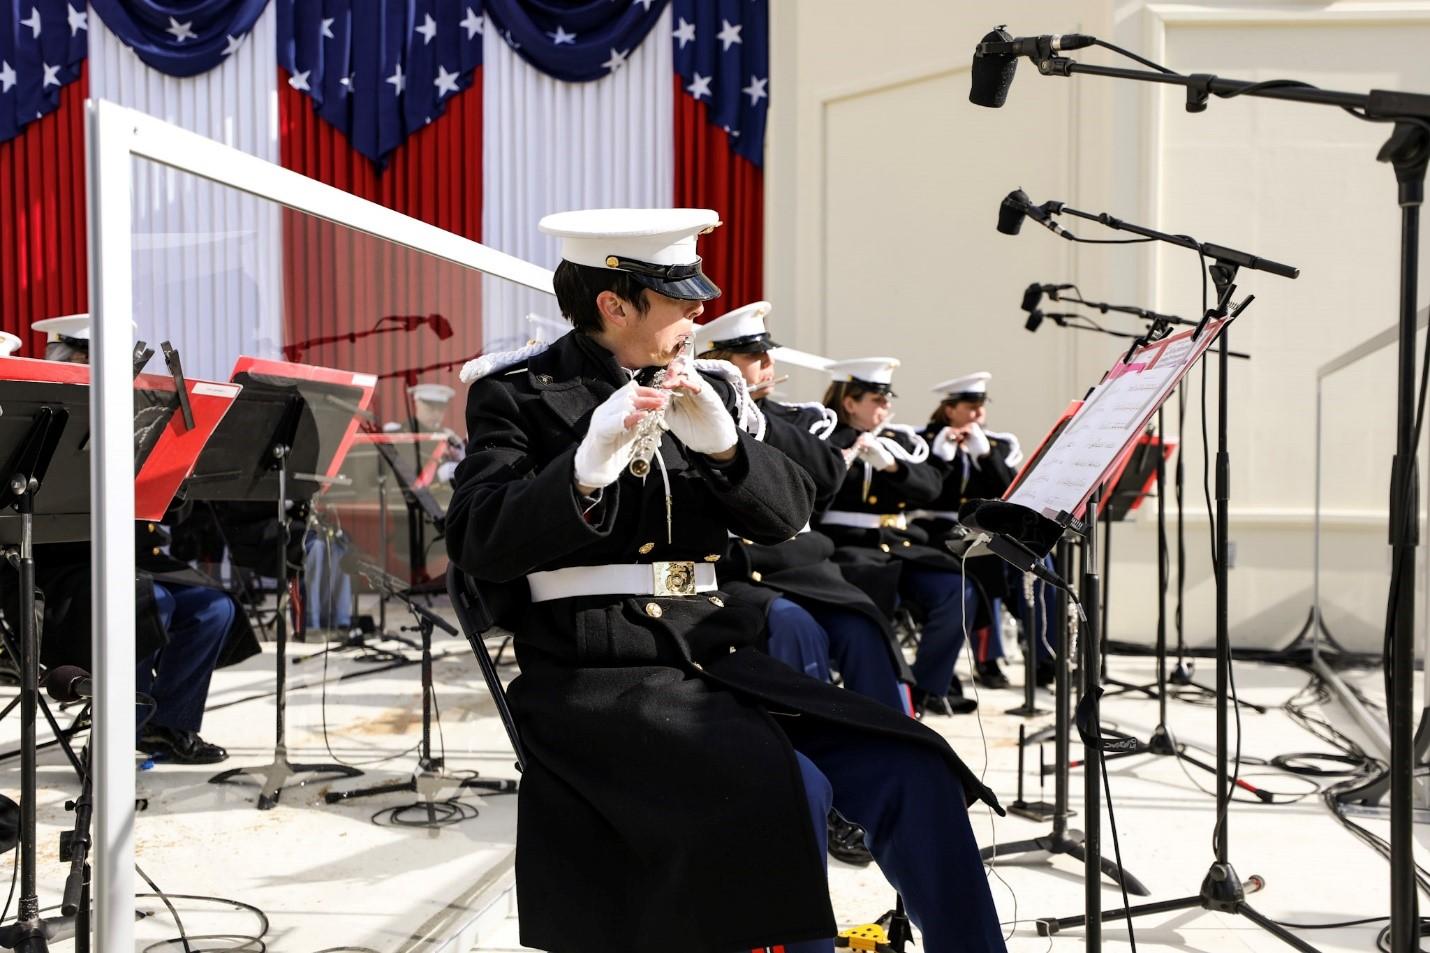 University of Iowa School of Music graduate Kara Santos plays the flute during President Joe Biden's inauguration on January 20, 2021.